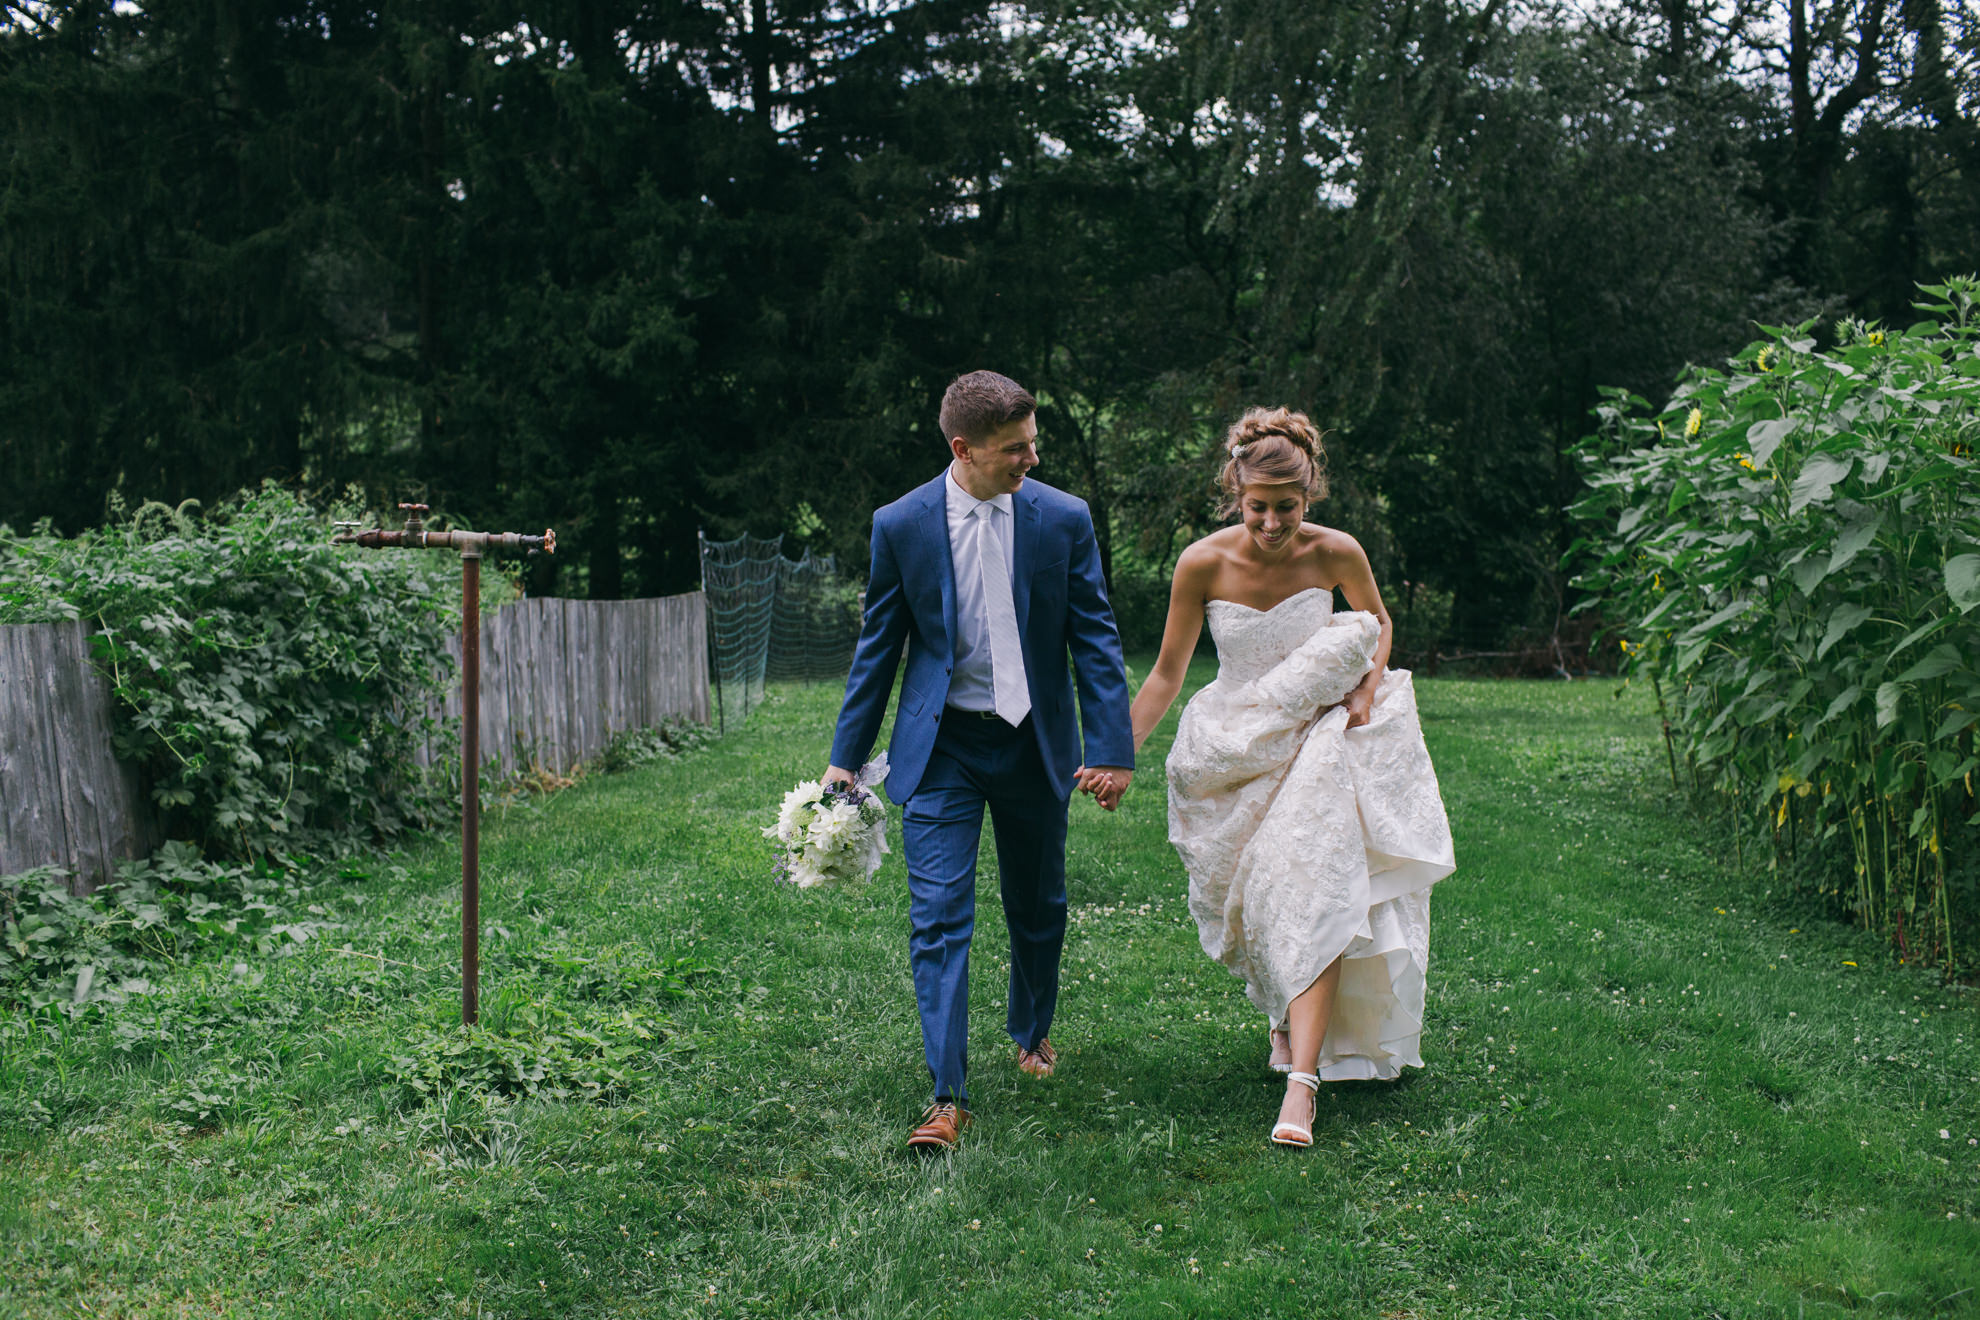 www.taylorlaurenbarker.com // @taylorlaurenbarker // Candid Wedding Photojournalist